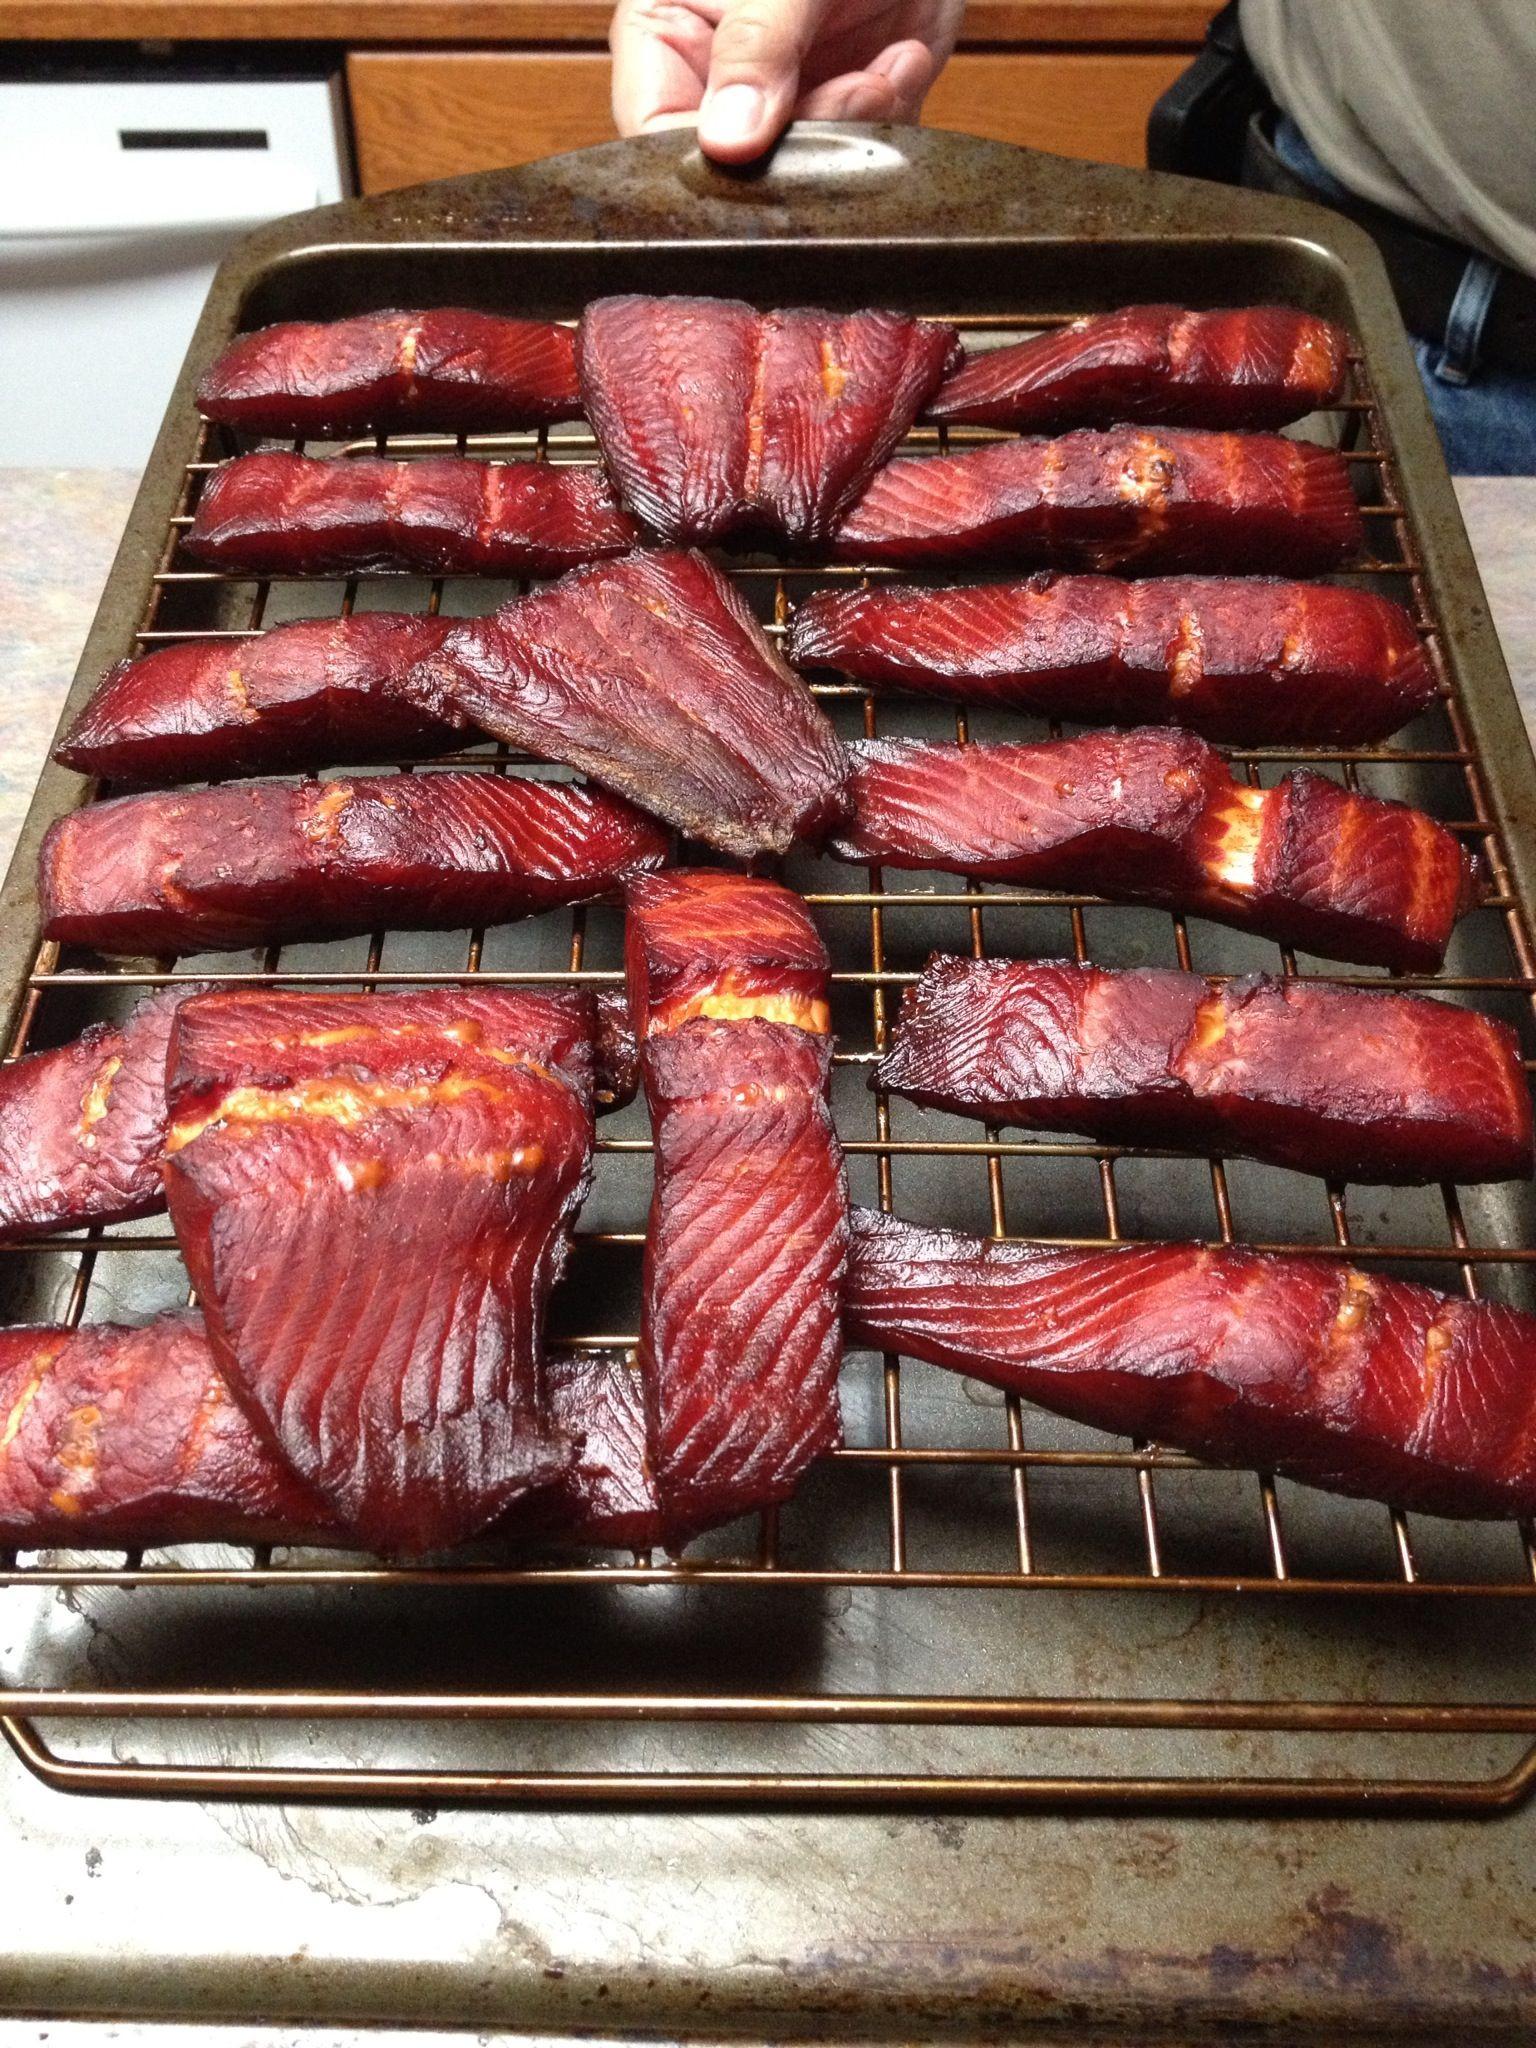 Smoked Salmon Traeger  Steel head salmon smoked on Traeger Grill